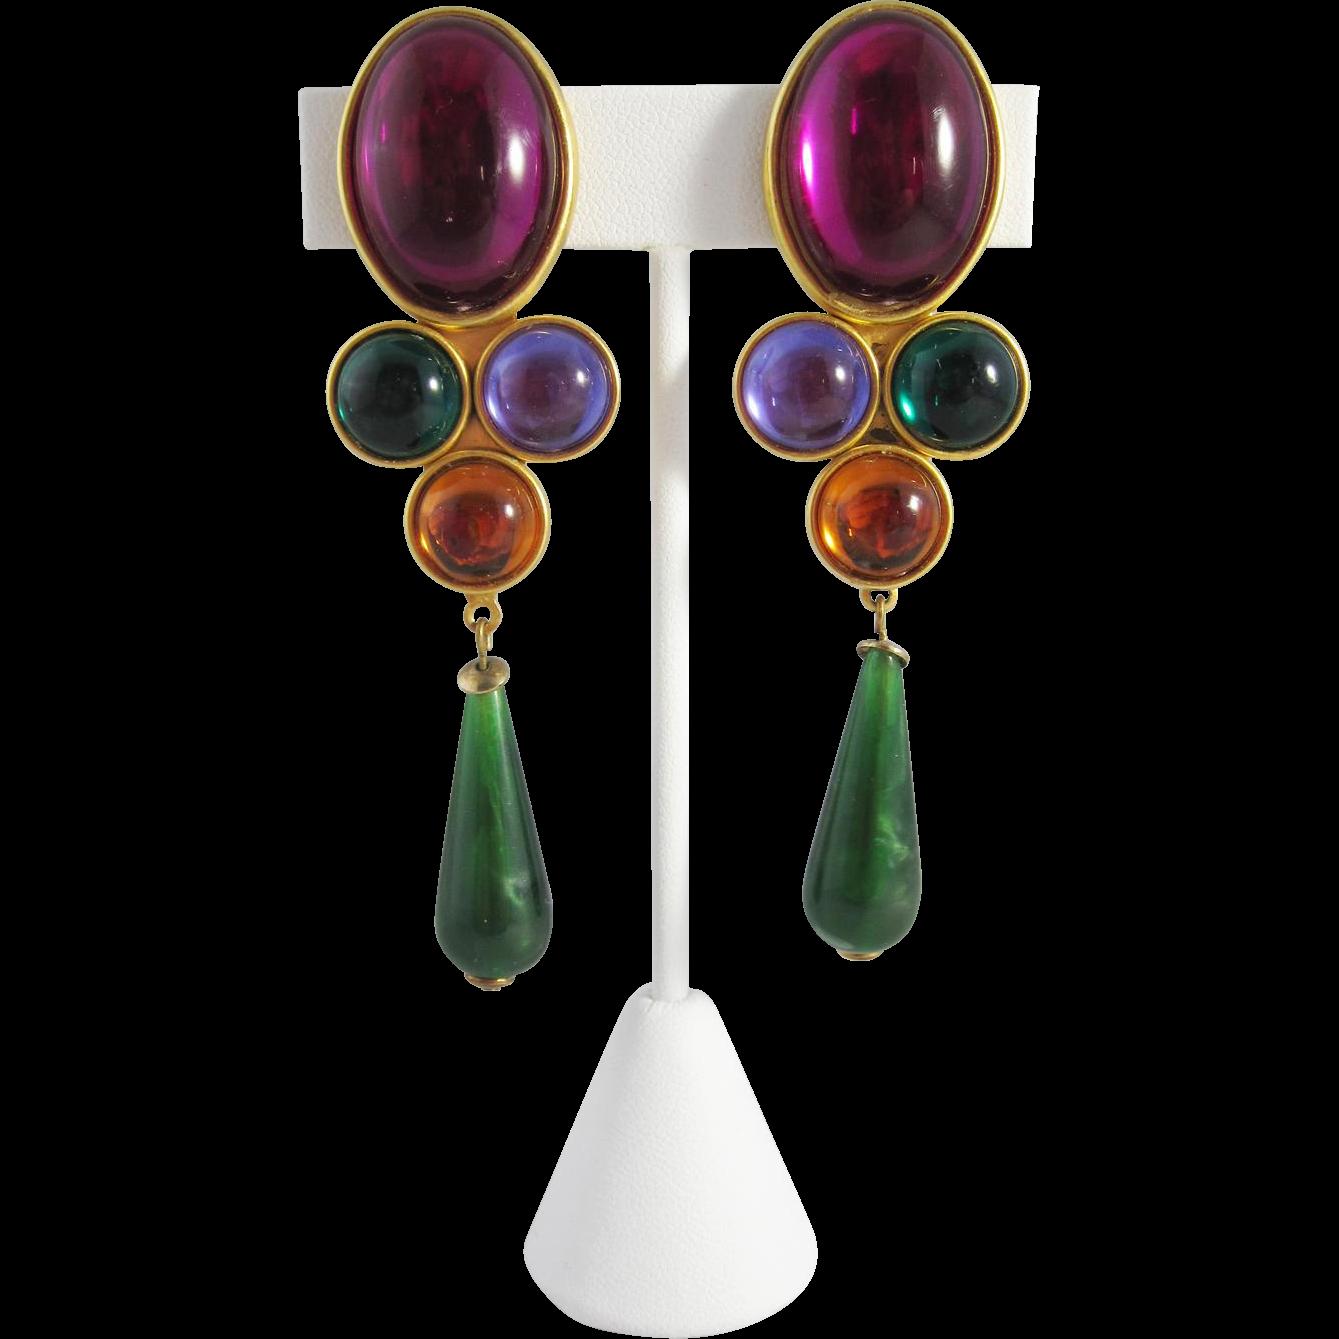 Vintage jeweled chandelier earrings vintage jewelry pinterest vintage jeweled chandelier earrings arubaitofo Images